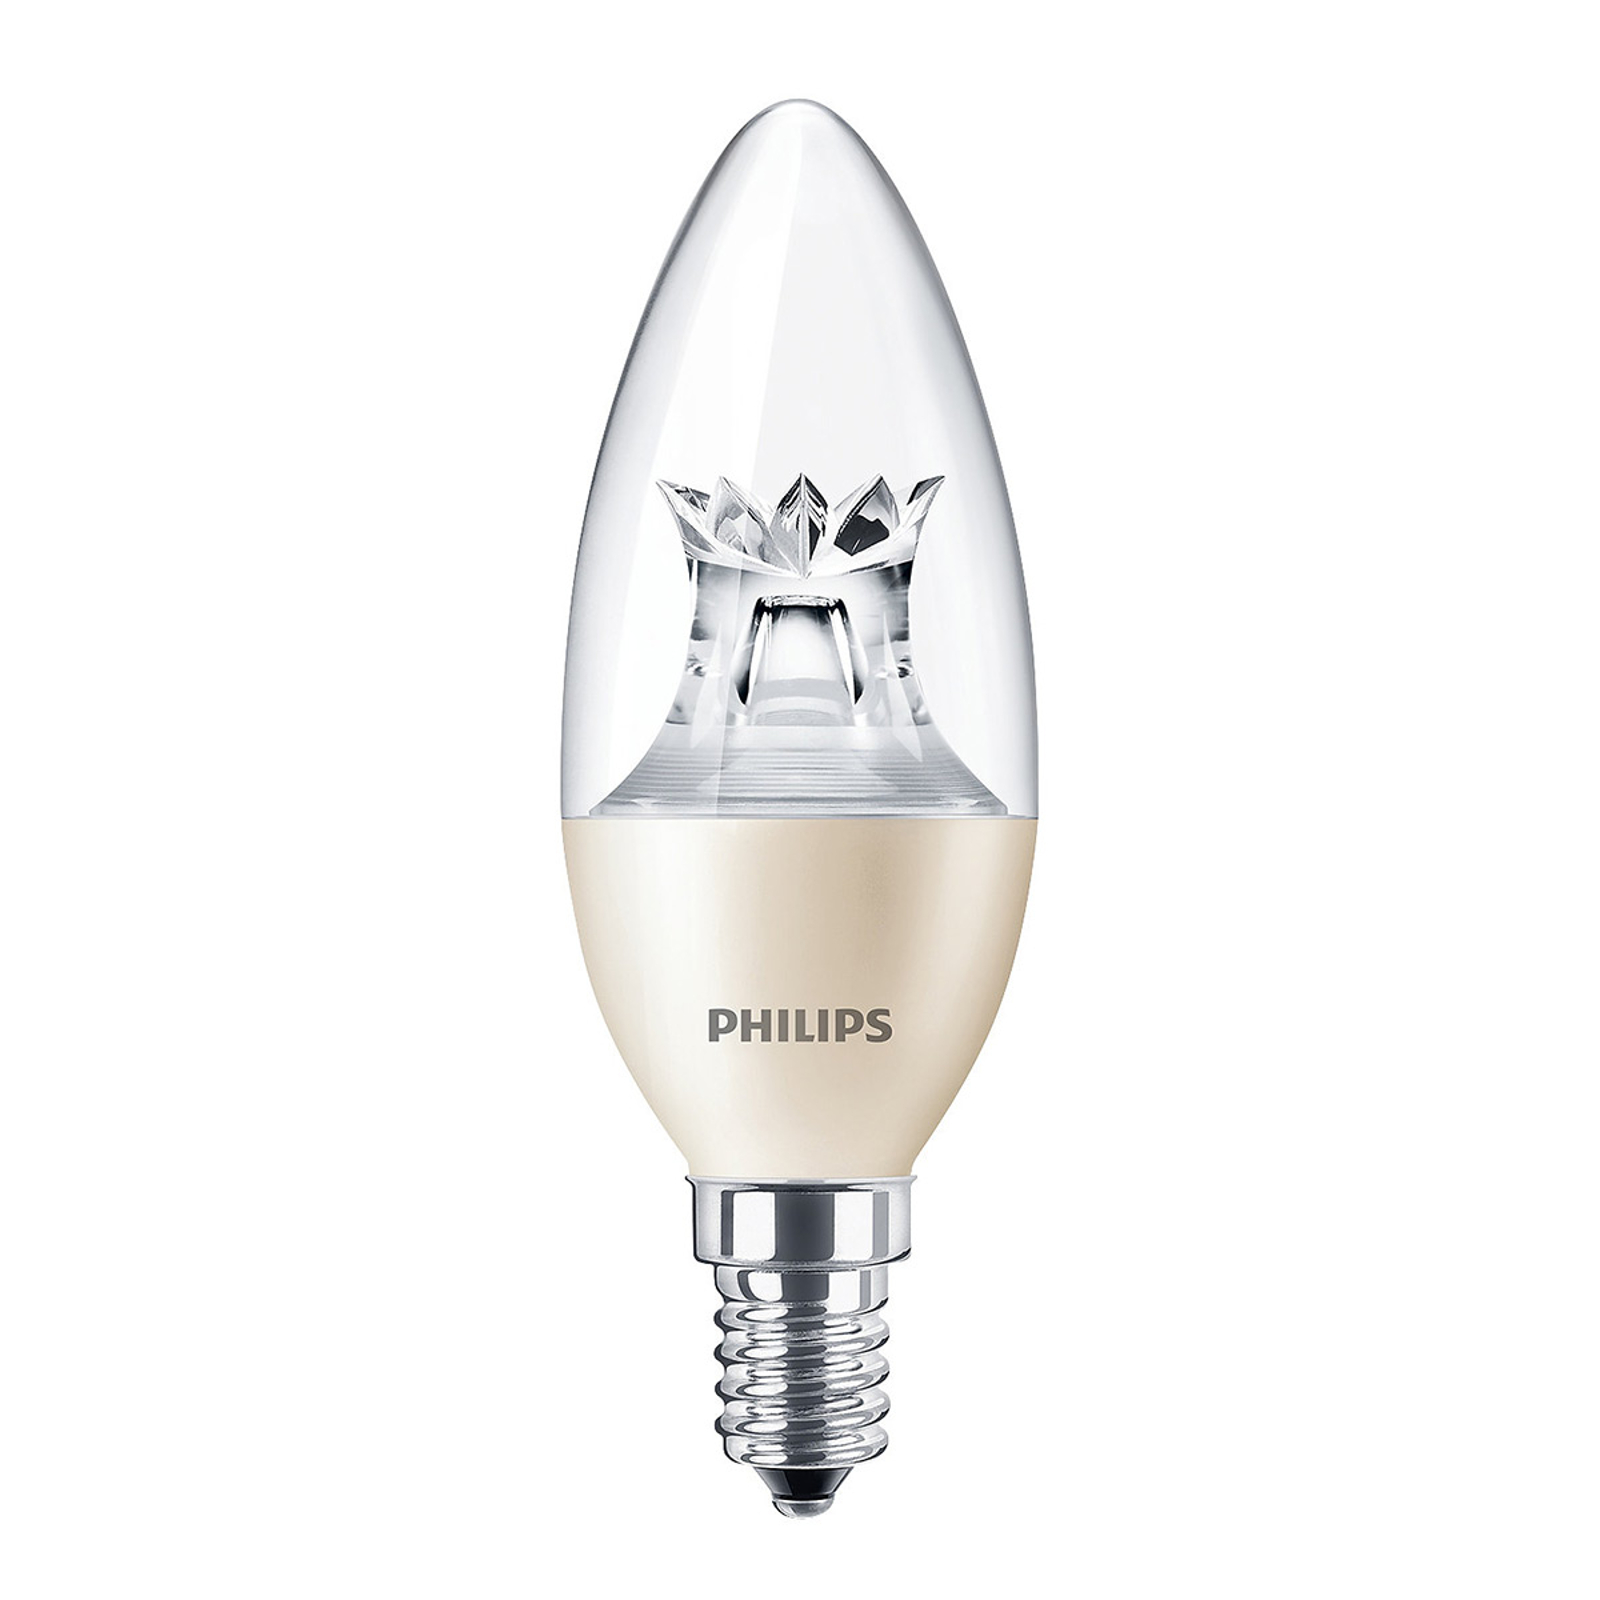 LED-kynttilälamppu E14 4W Candle DT CL DimTone